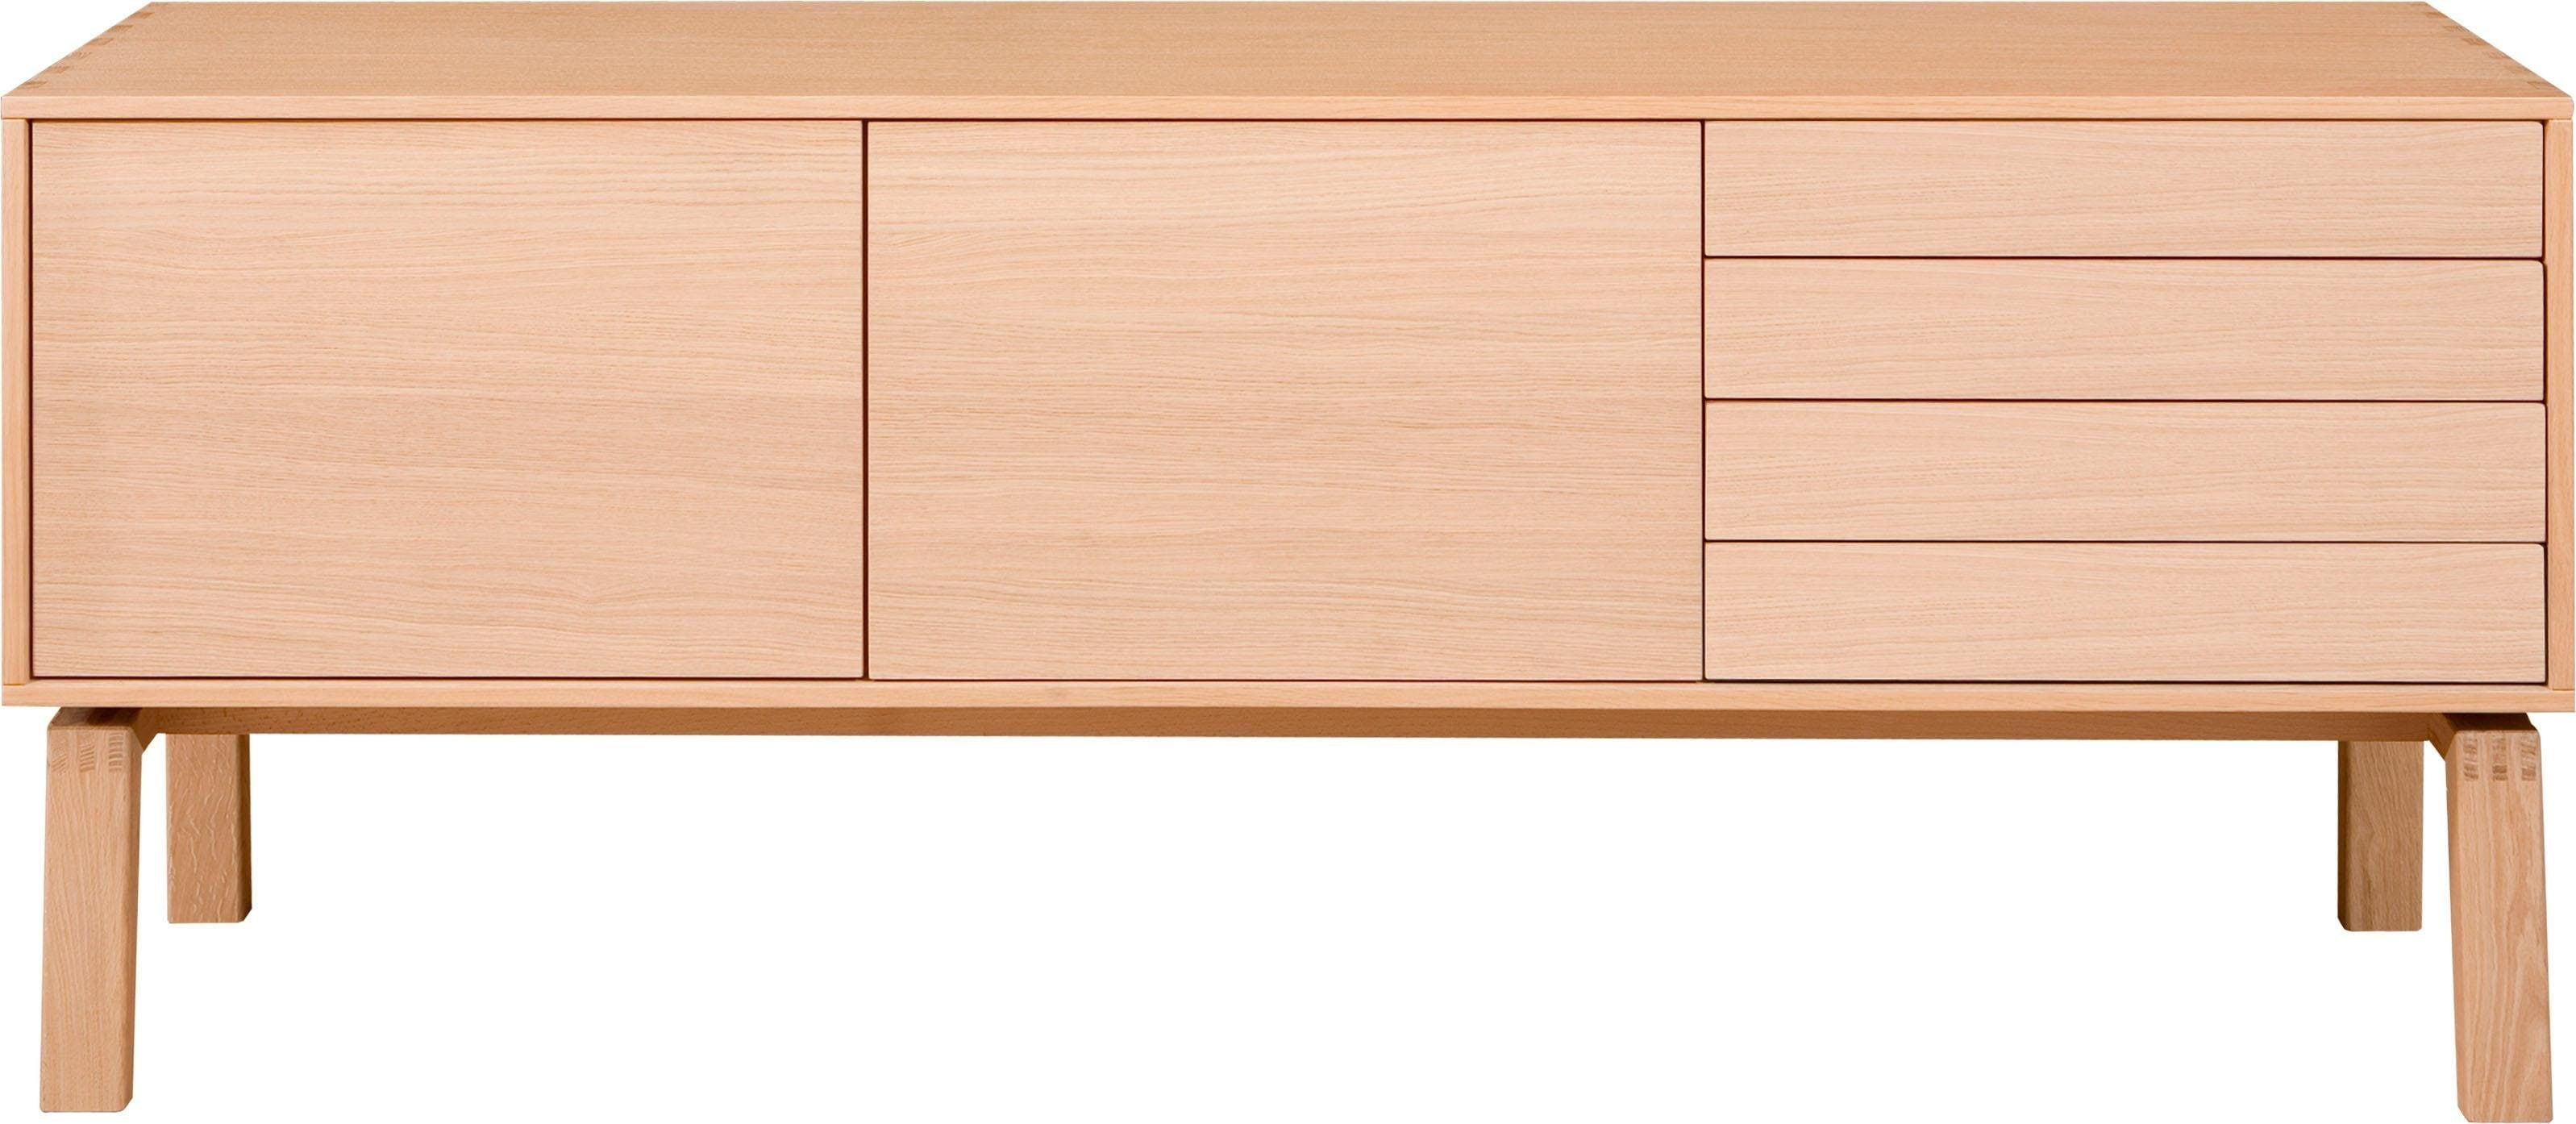 PBJ Sideboard Joint Highboard